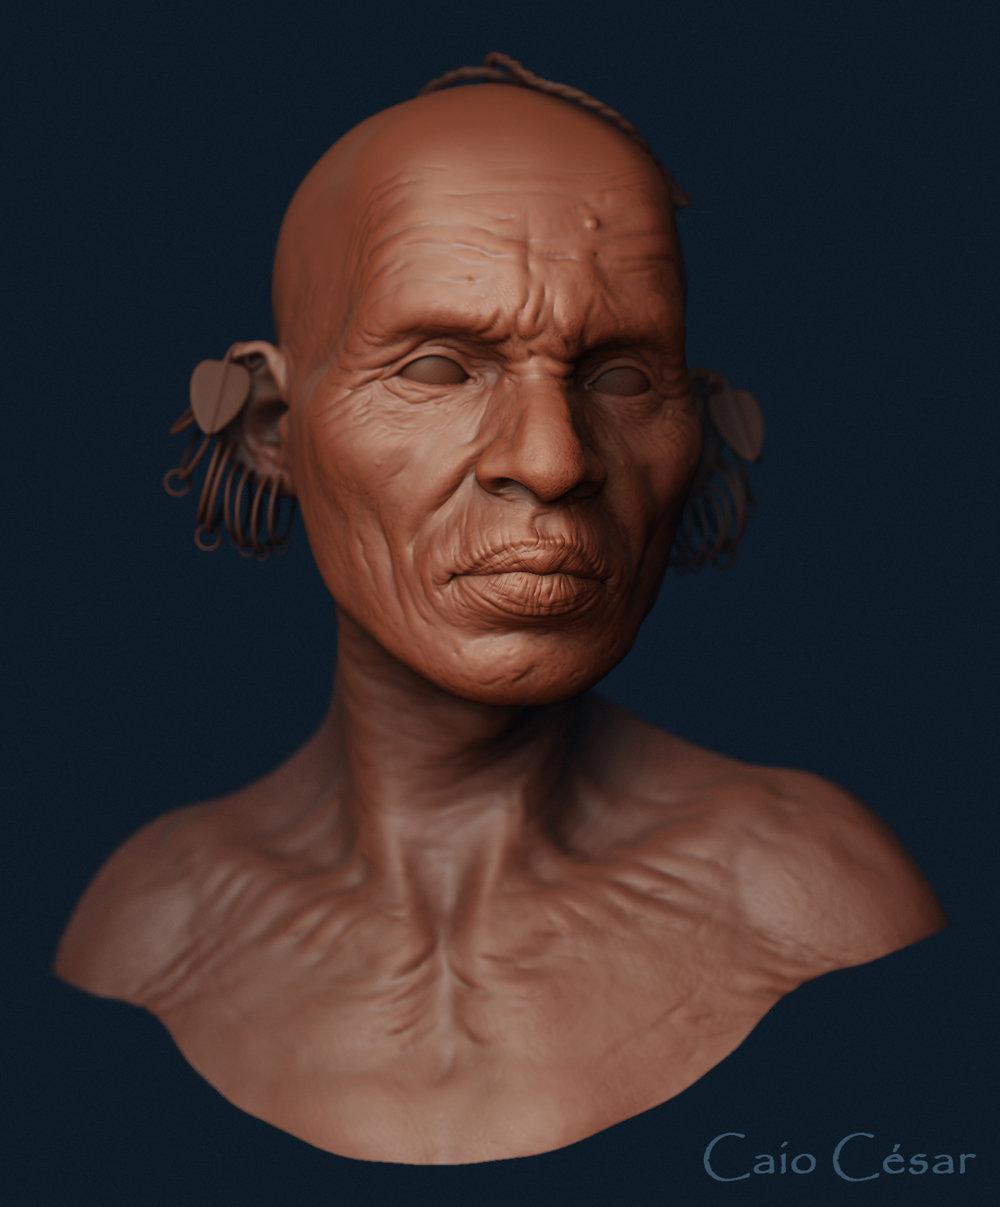 Caio cesar africano